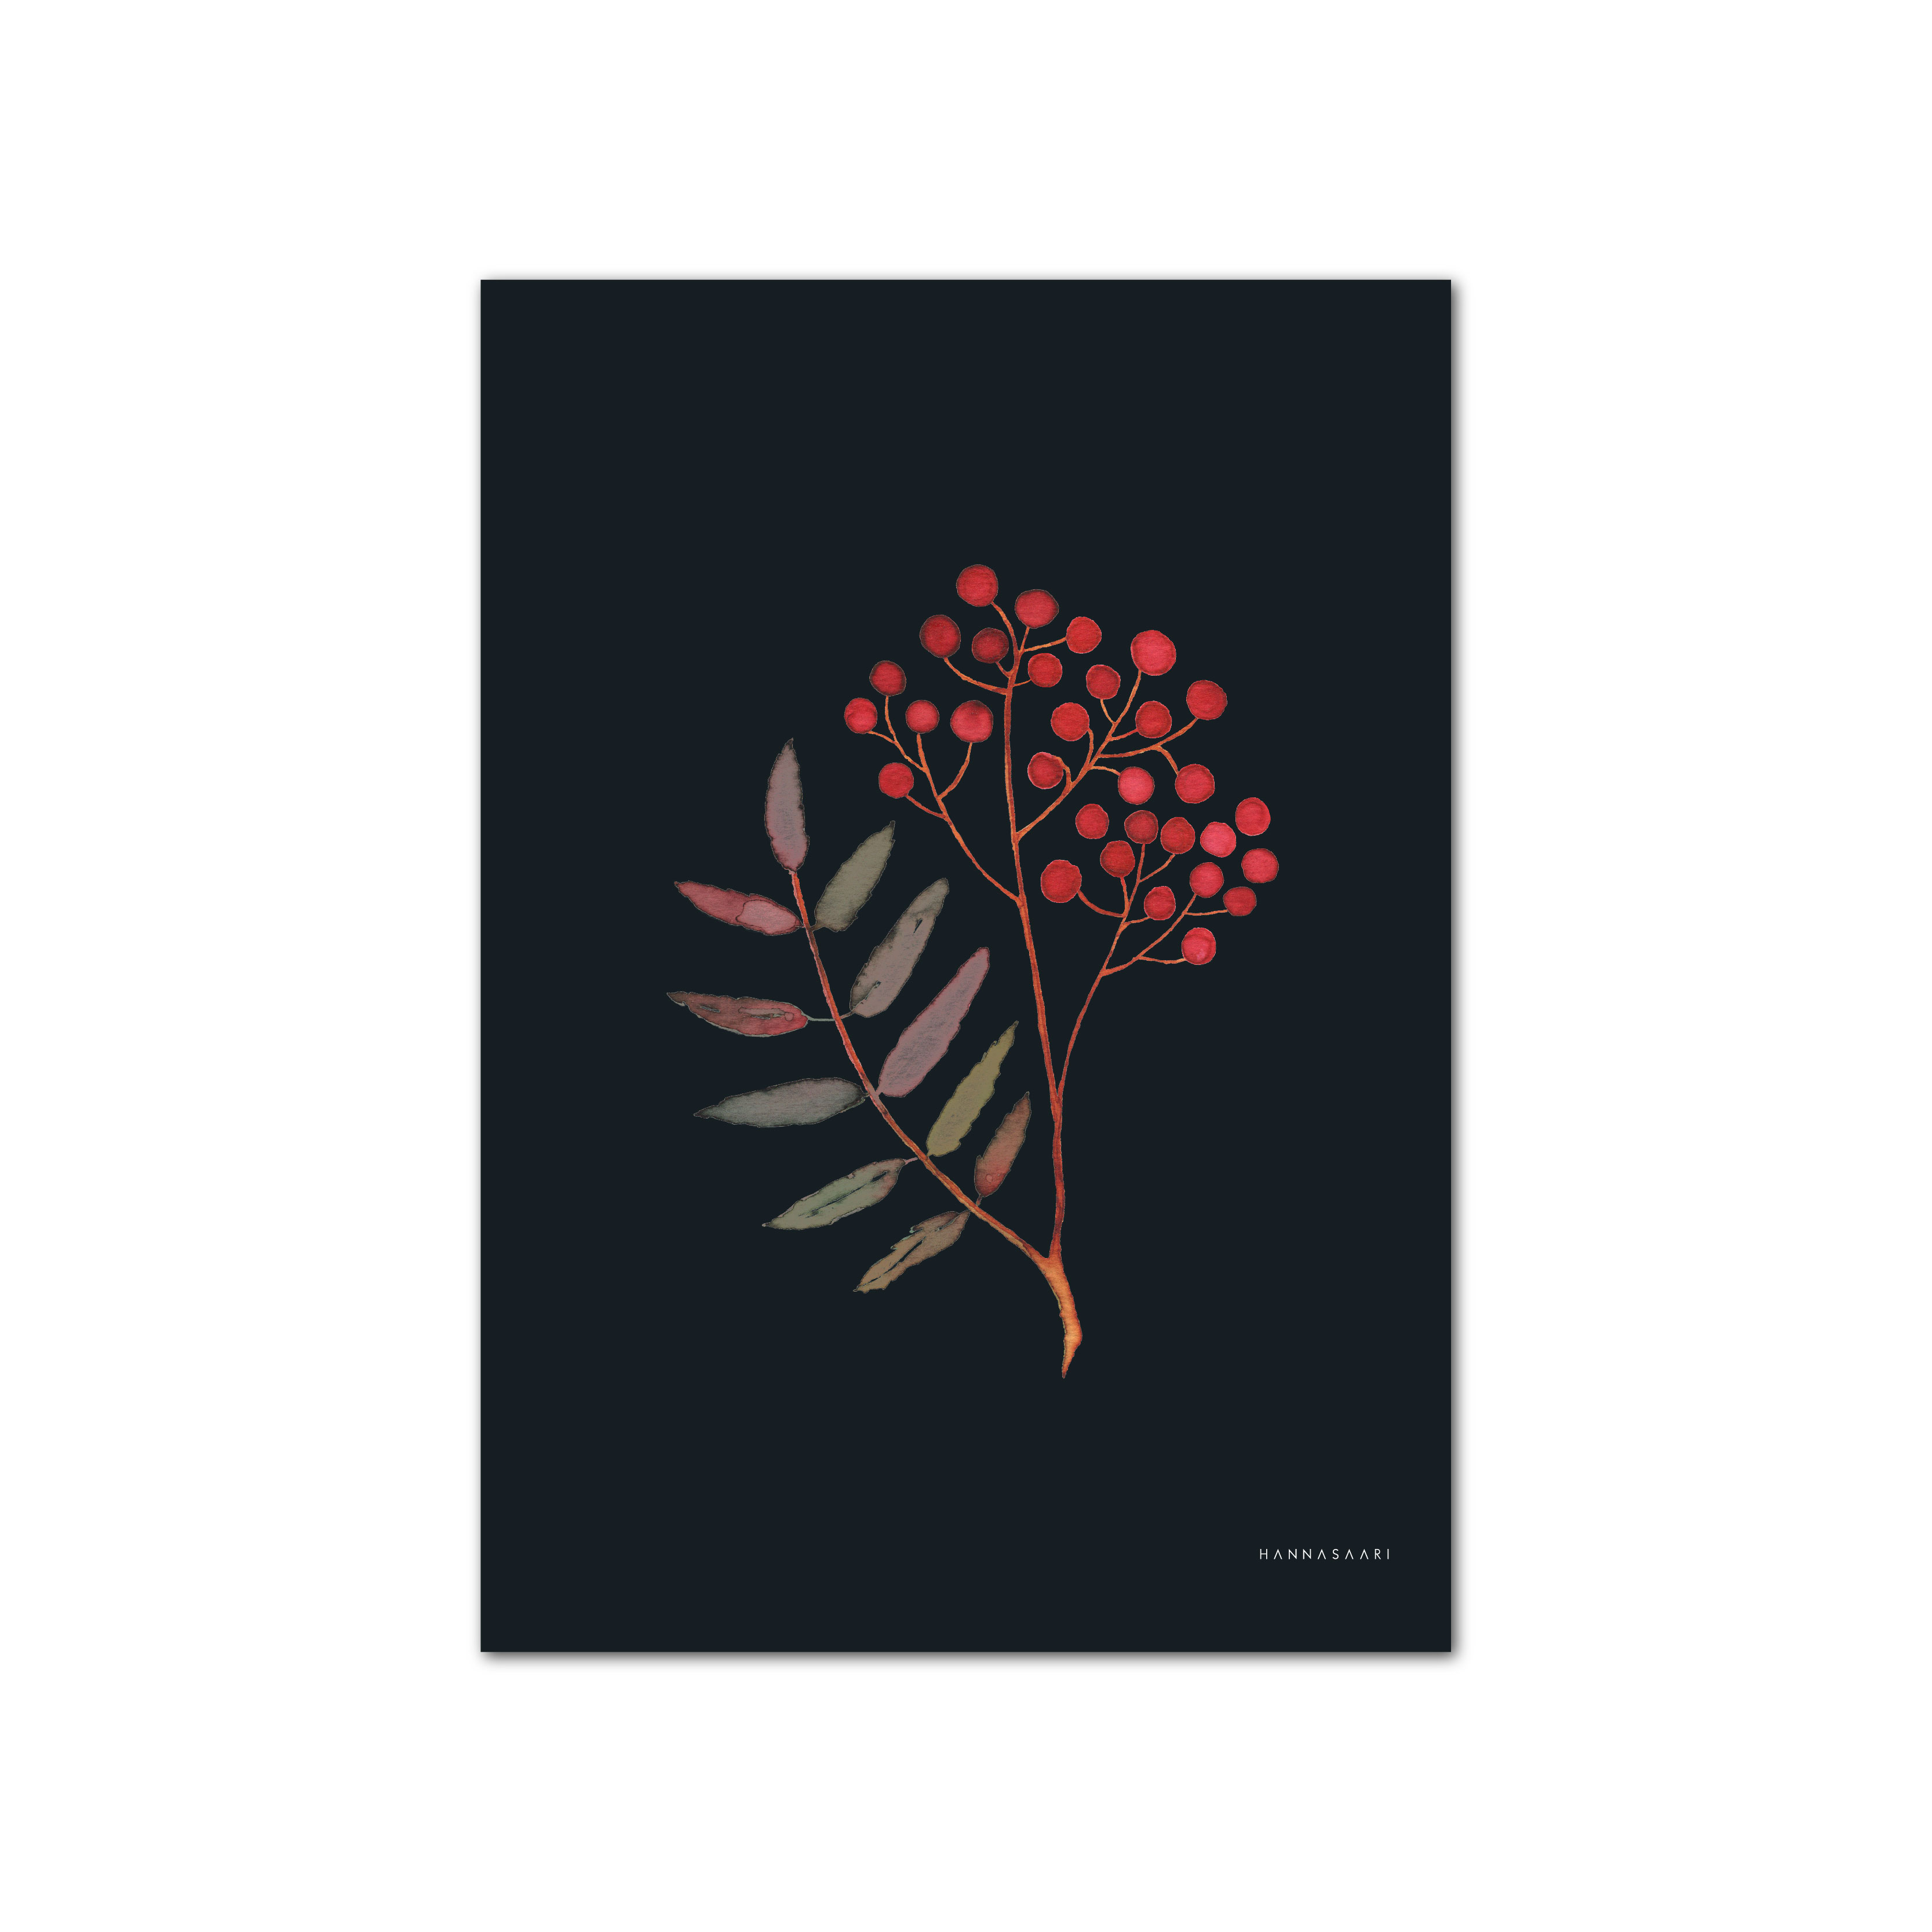 Pihlaja kortti-poster A4